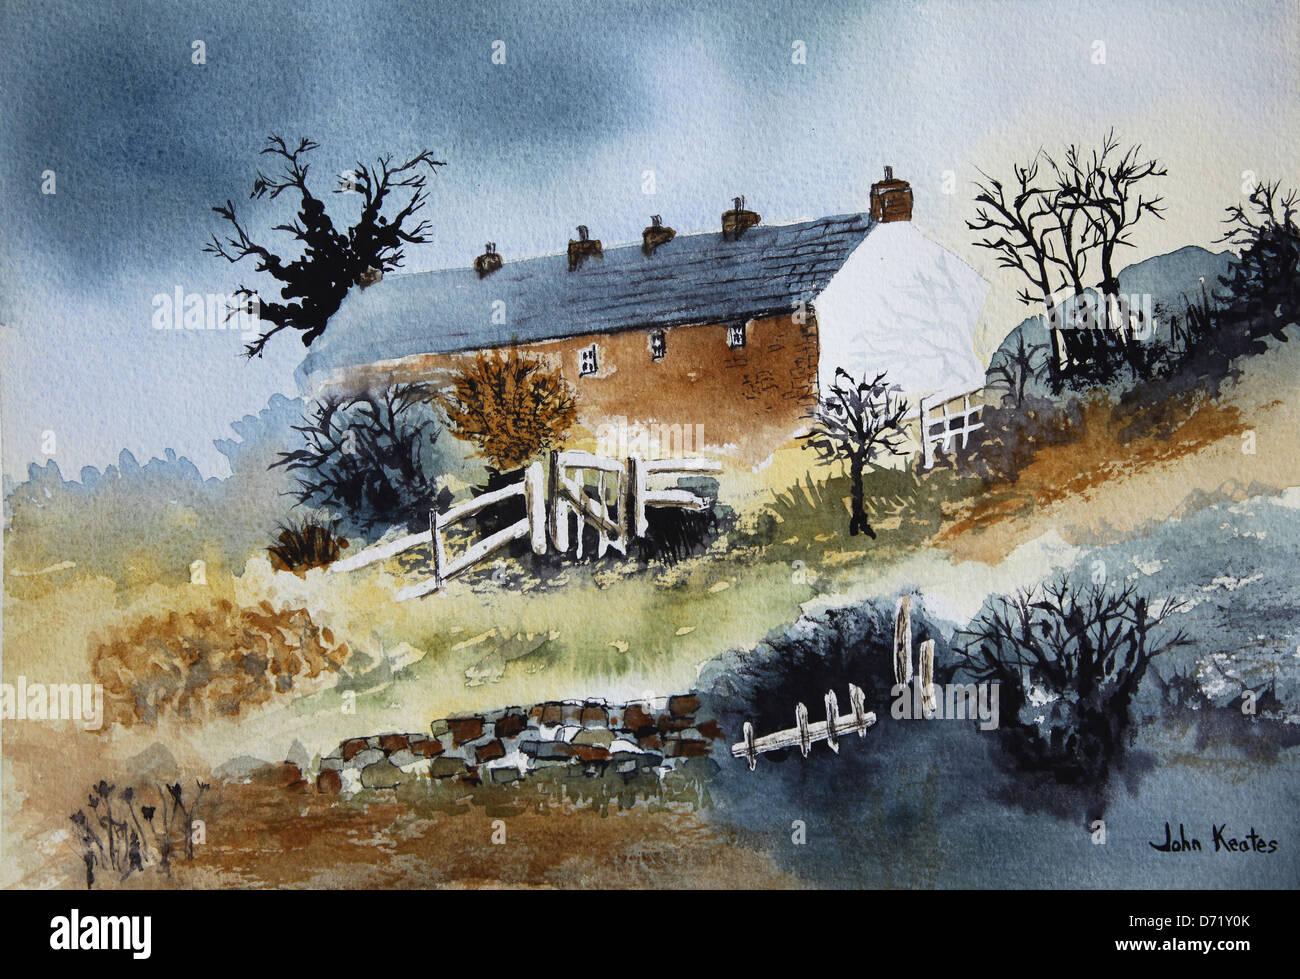 original-watercolour-landscape-painting-by-the-artist-john-keates-D71Y0K.jpg